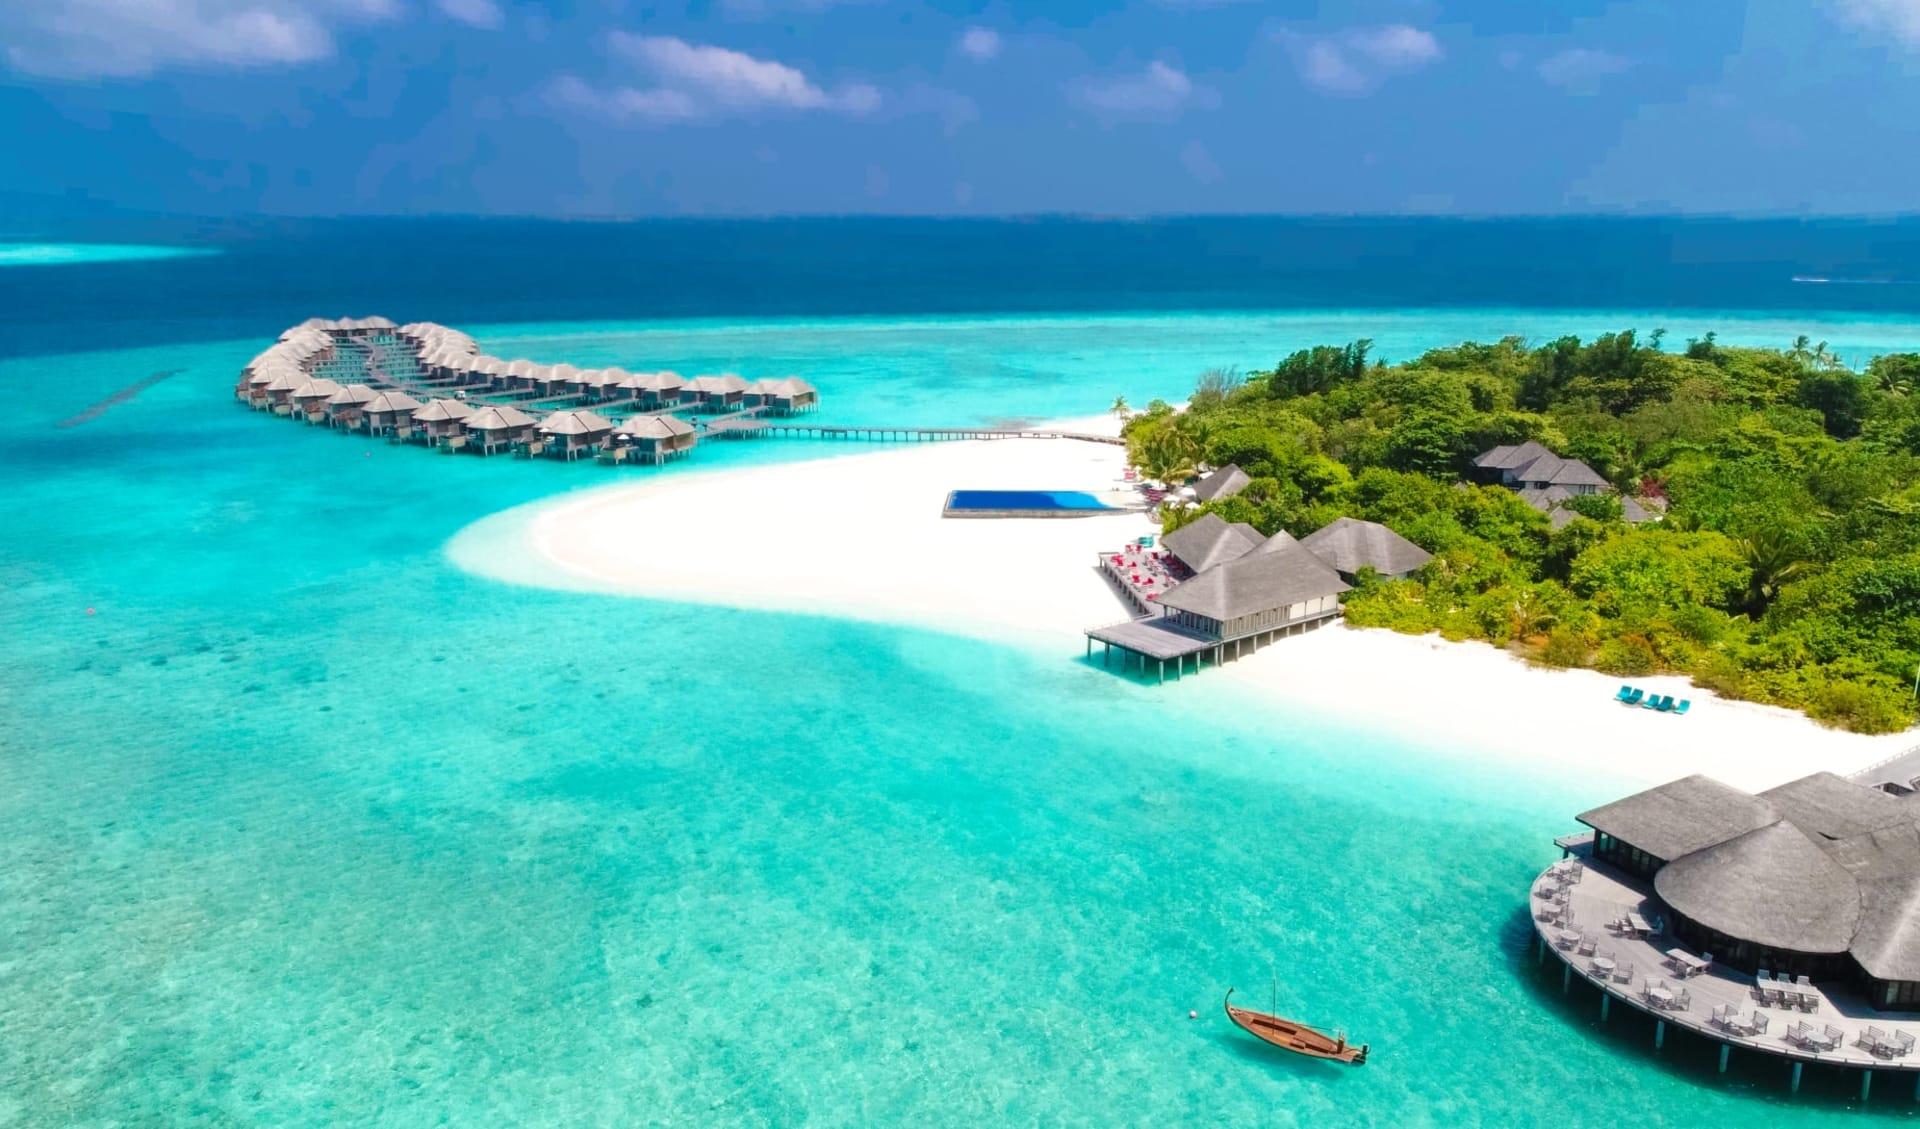 JA Manafaru in Haa Alifu-Atoll: